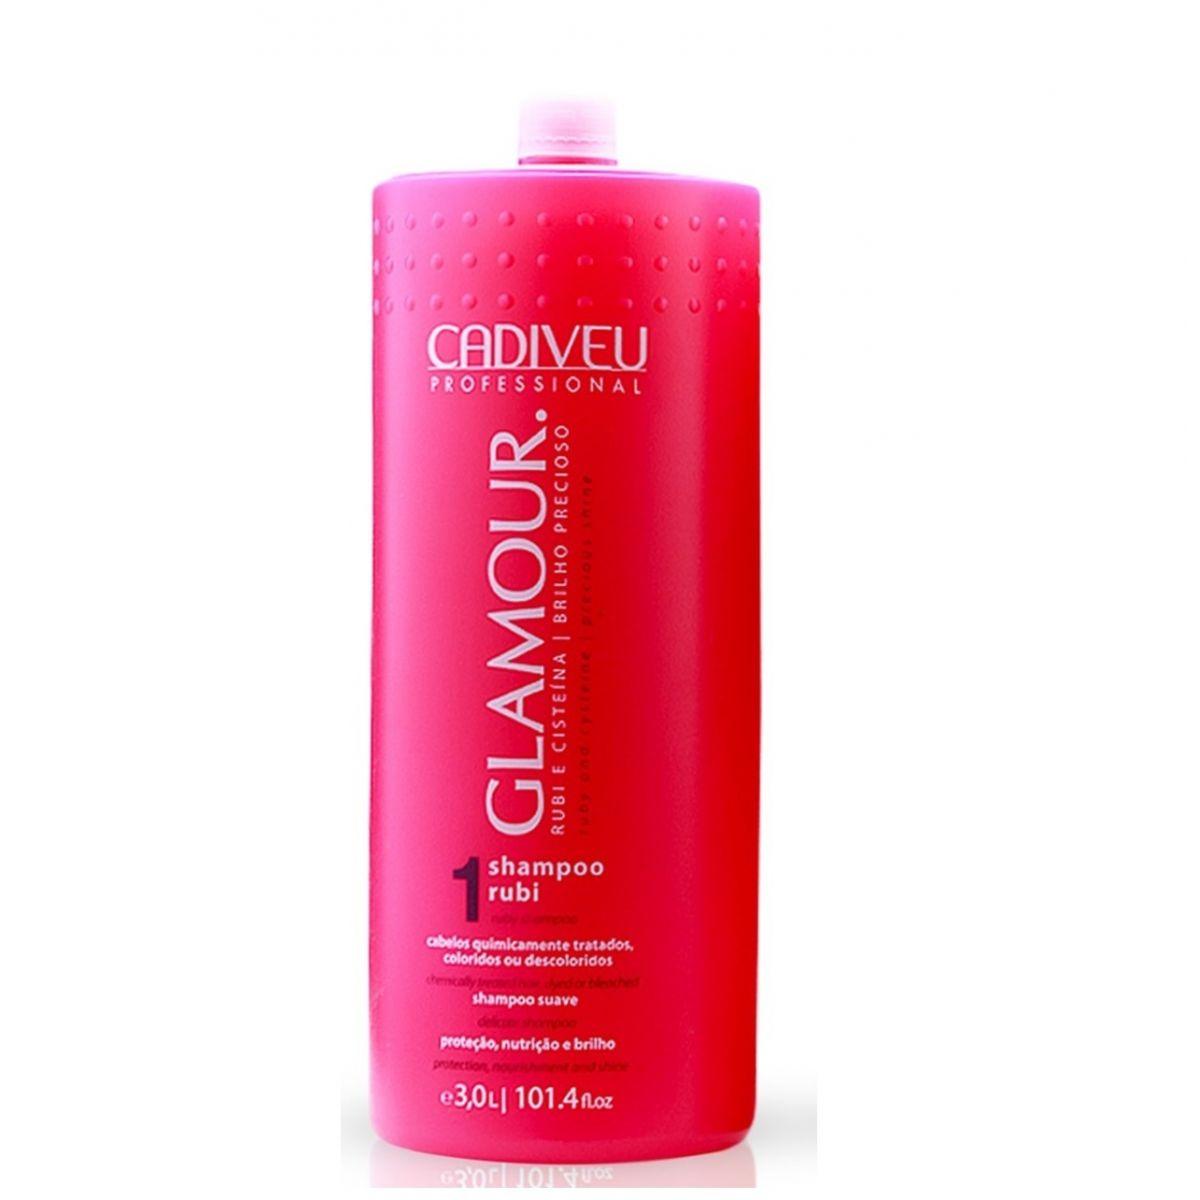 Cadiveu Glamour Rubi Shampoo - 3L